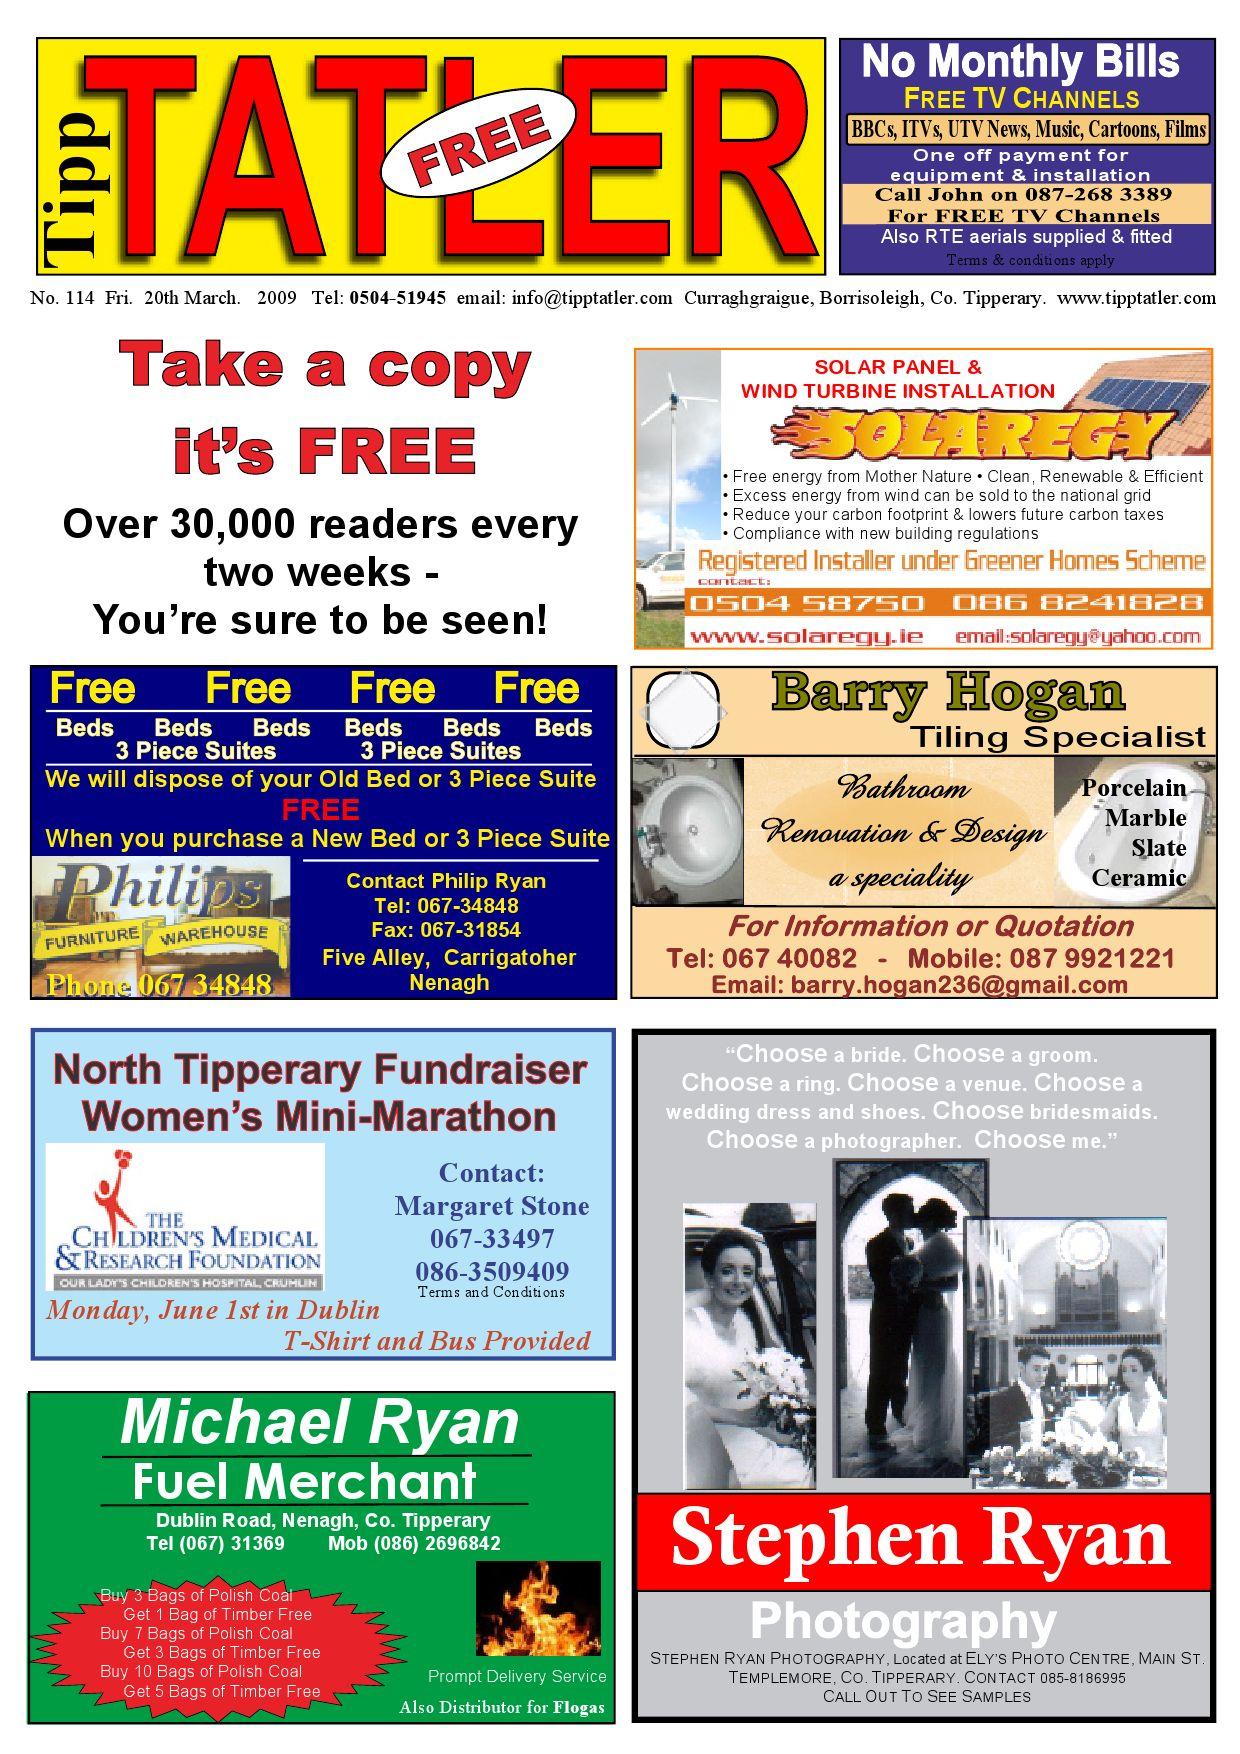 tipp tatler issue 114 march 2009 by tipp tatler issuu